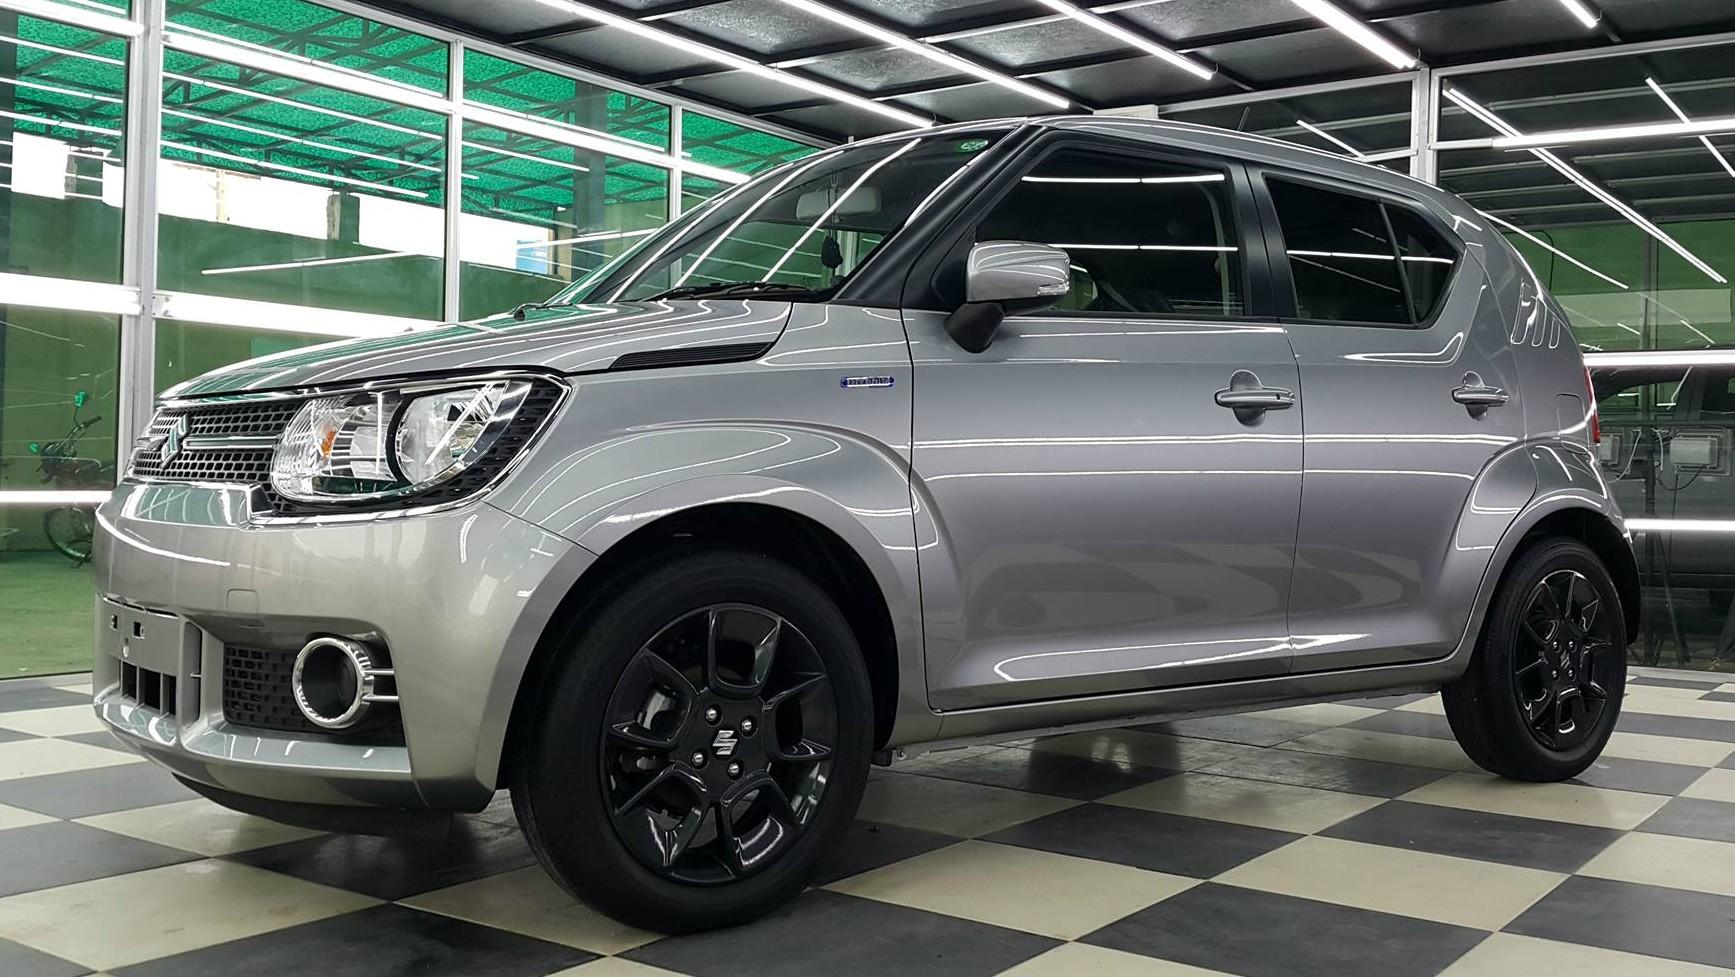 Suzuki-ignis-hybrid-2016-2-e1471431604409